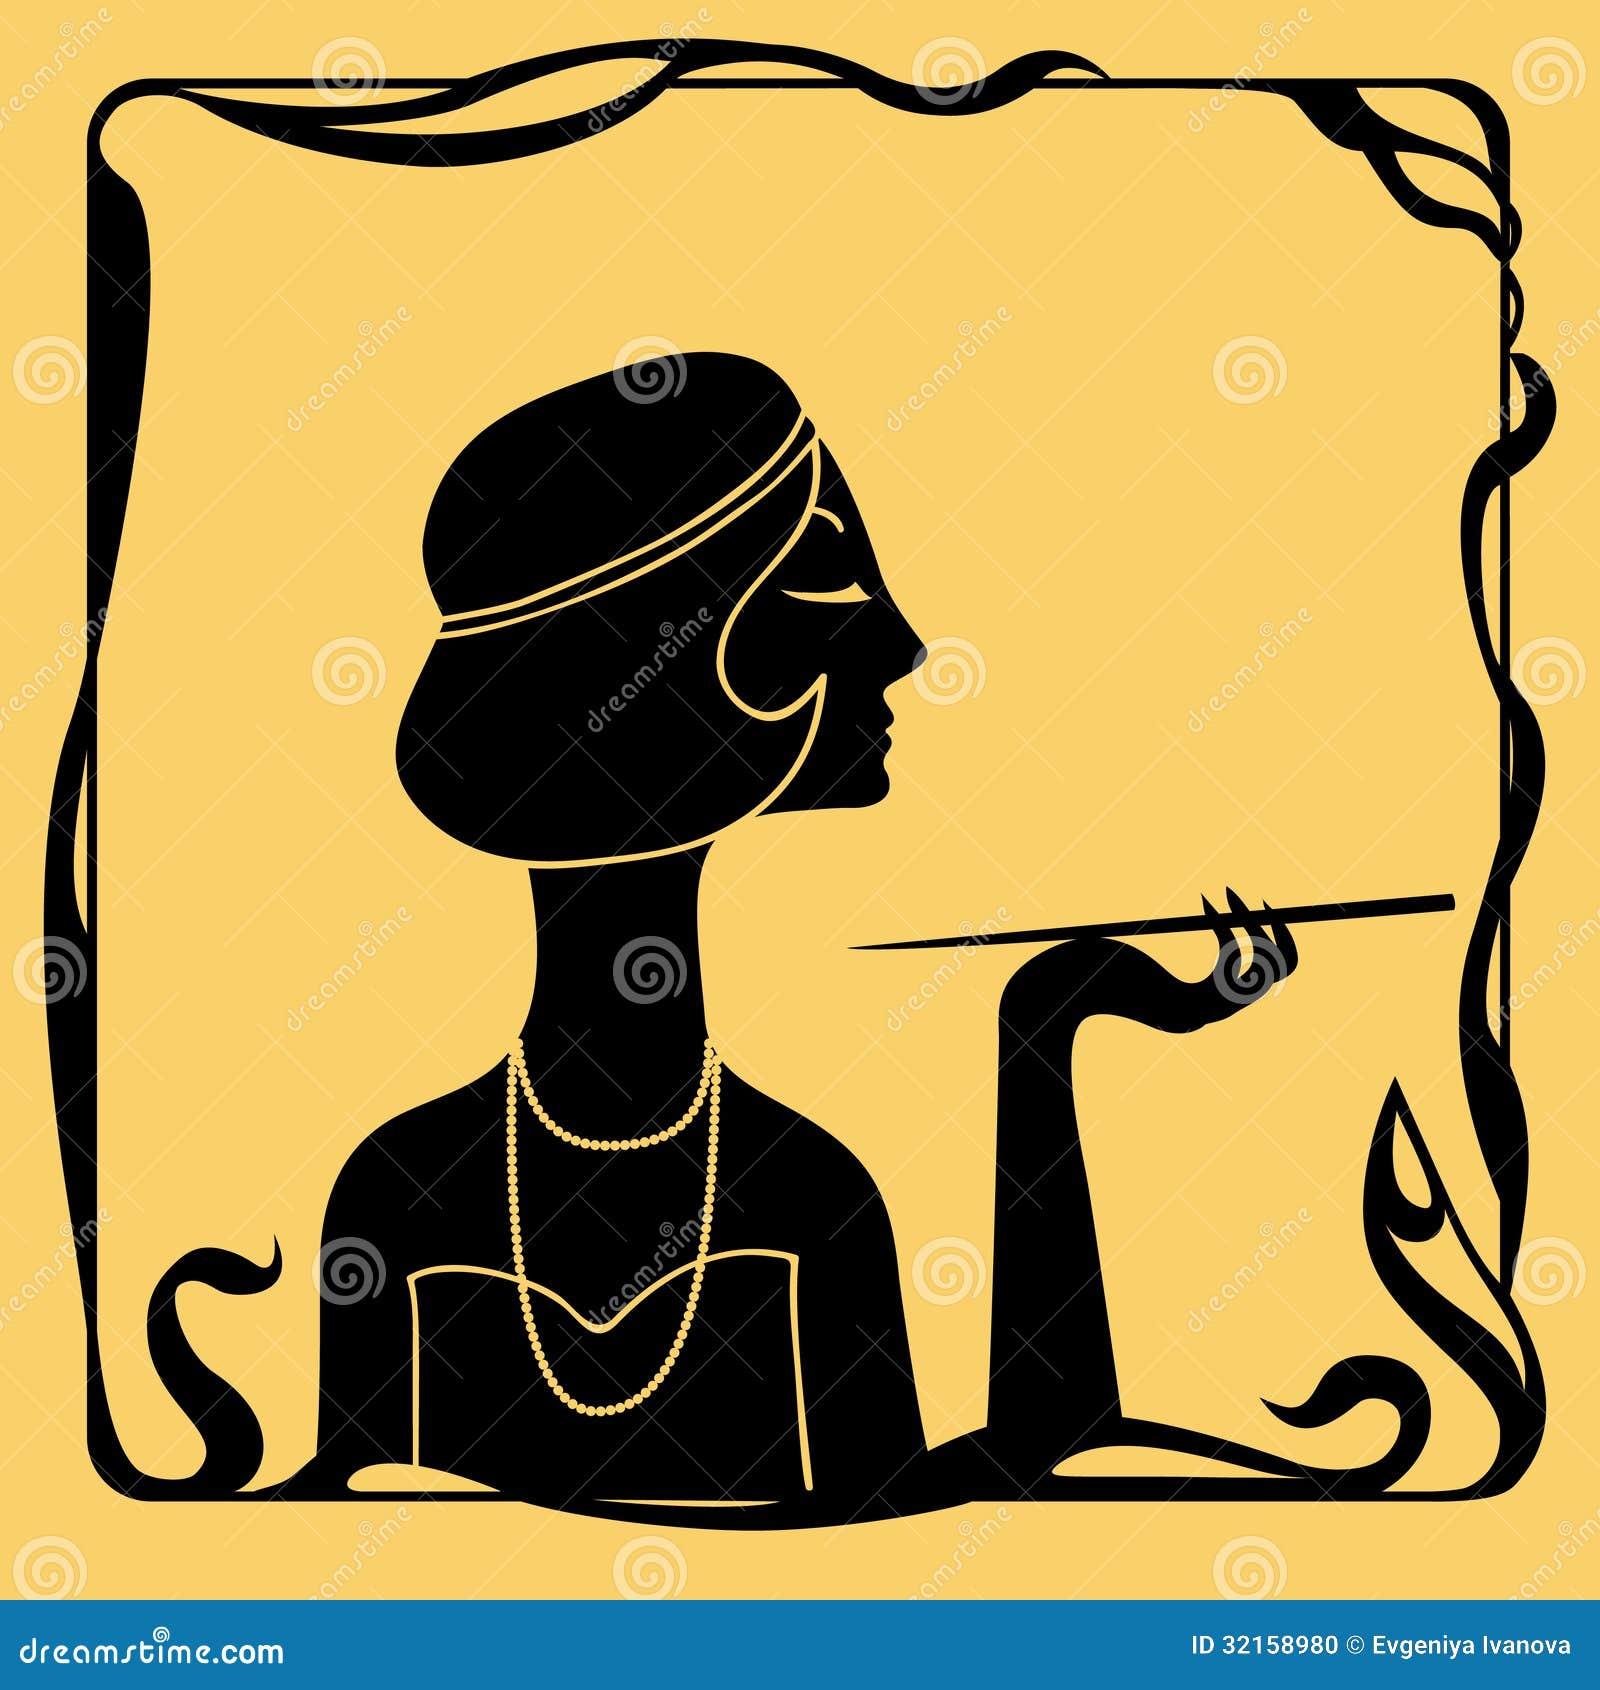 Art Deco Woman Profile Silhouette Stock Illustration - Illustration ...